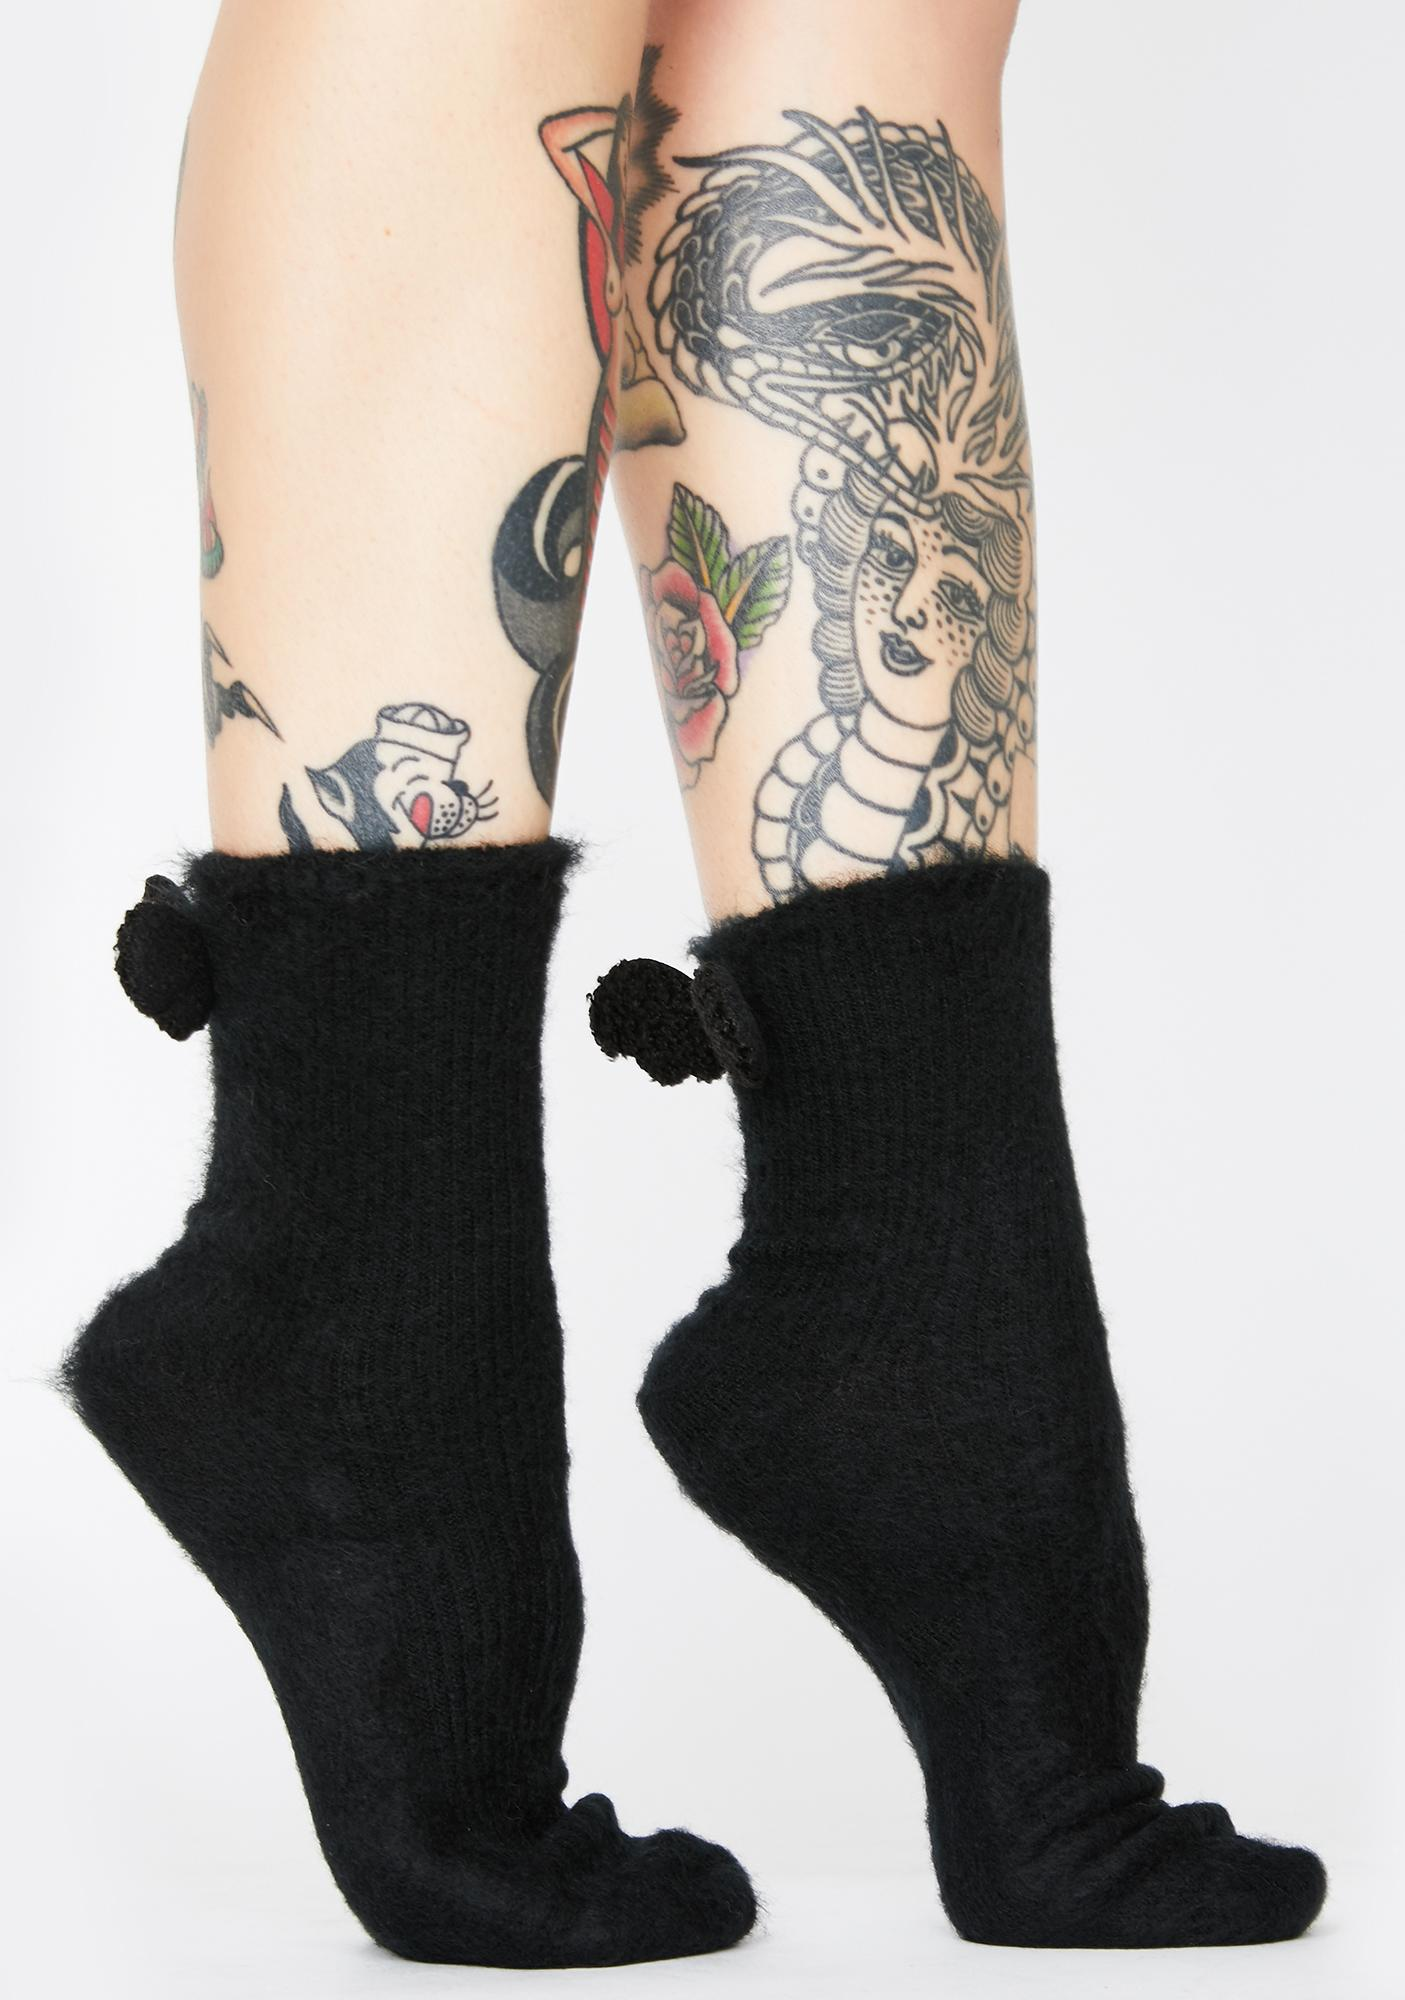 Dark Love Angel Fuzzy Socks With Wings